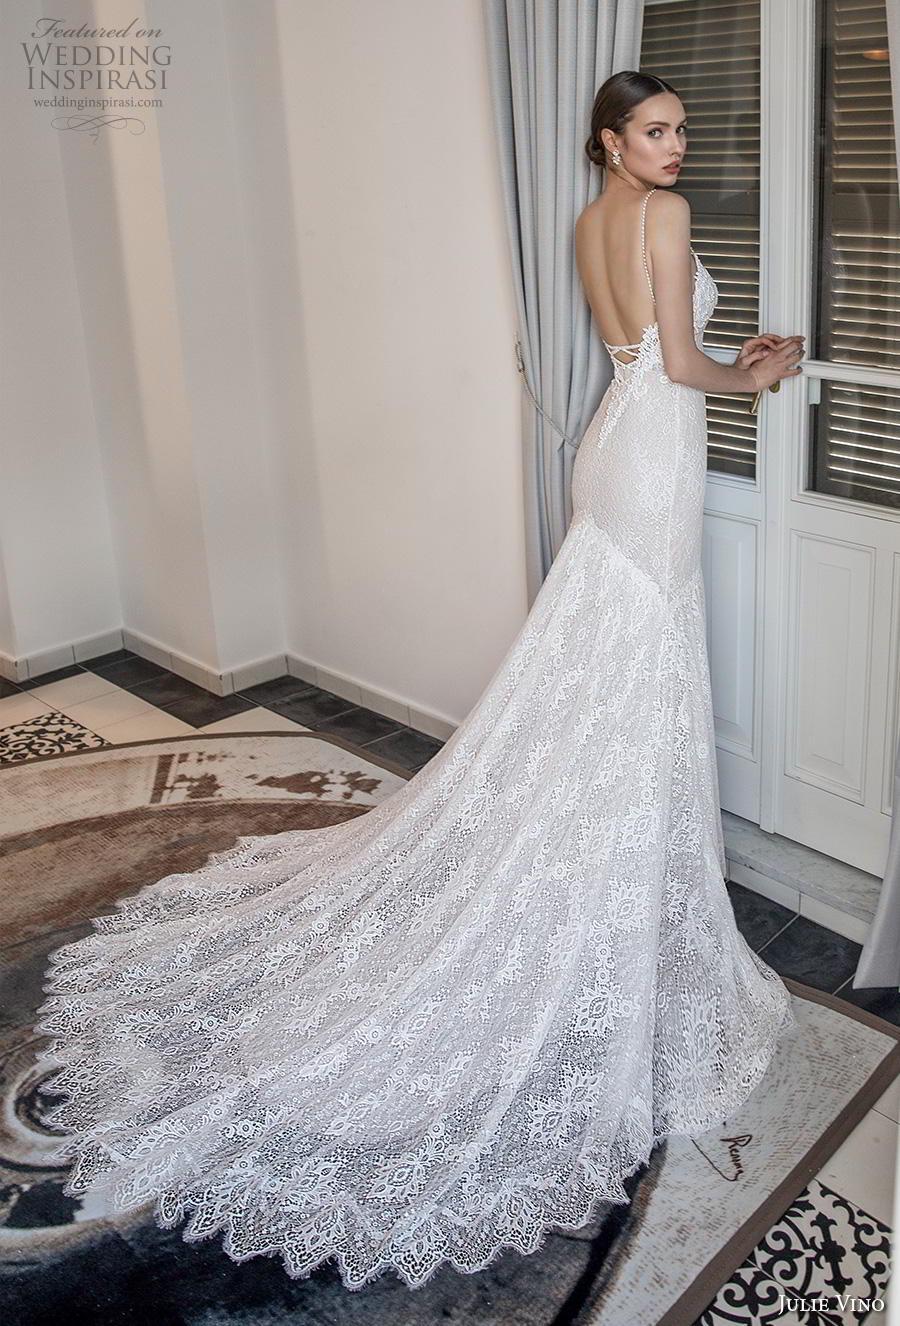 julie vino 2020 romanzo bridal thin strap deep sweetheart neckline full embellishment sexy glamorous mermaid wedding dress backless low back chapel train (1) bv